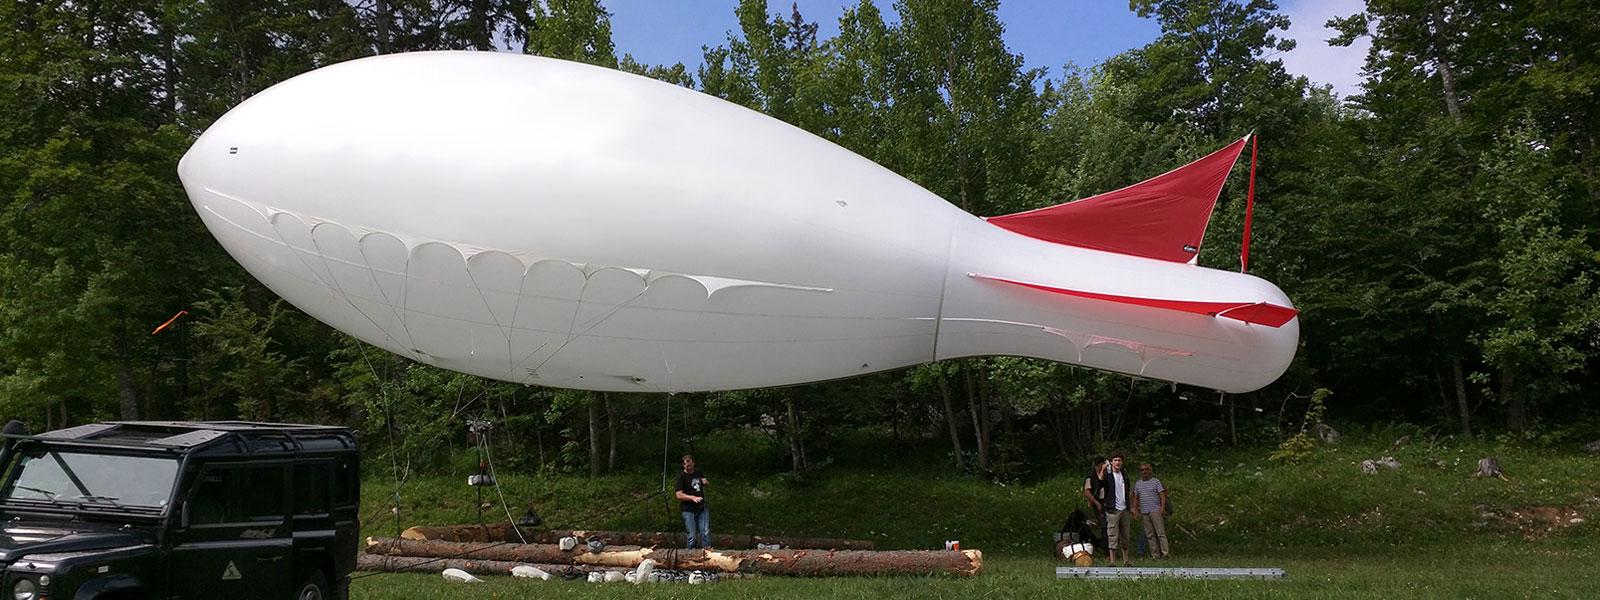 2015_Aerospace_Dirigeable_Aerolifter-01-1600x600